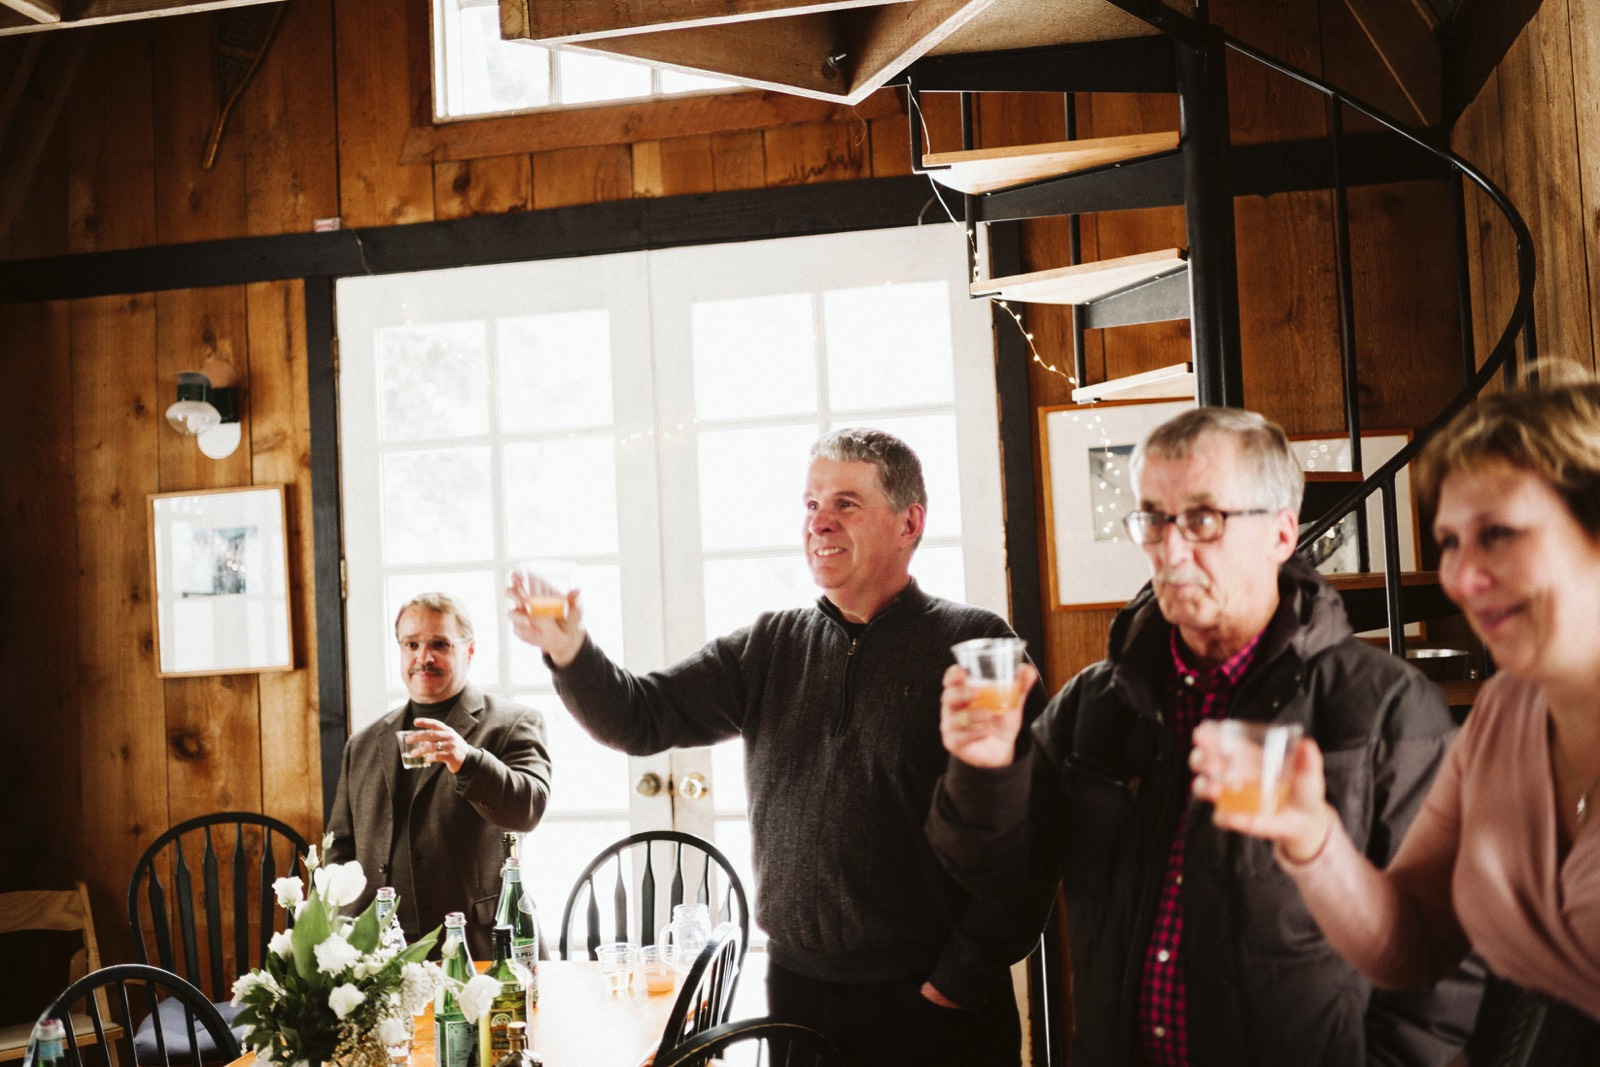 alpine-lakes-high-camp-winter-wedding-79 ALPINE LAKES HIGH CAMP WEDDING